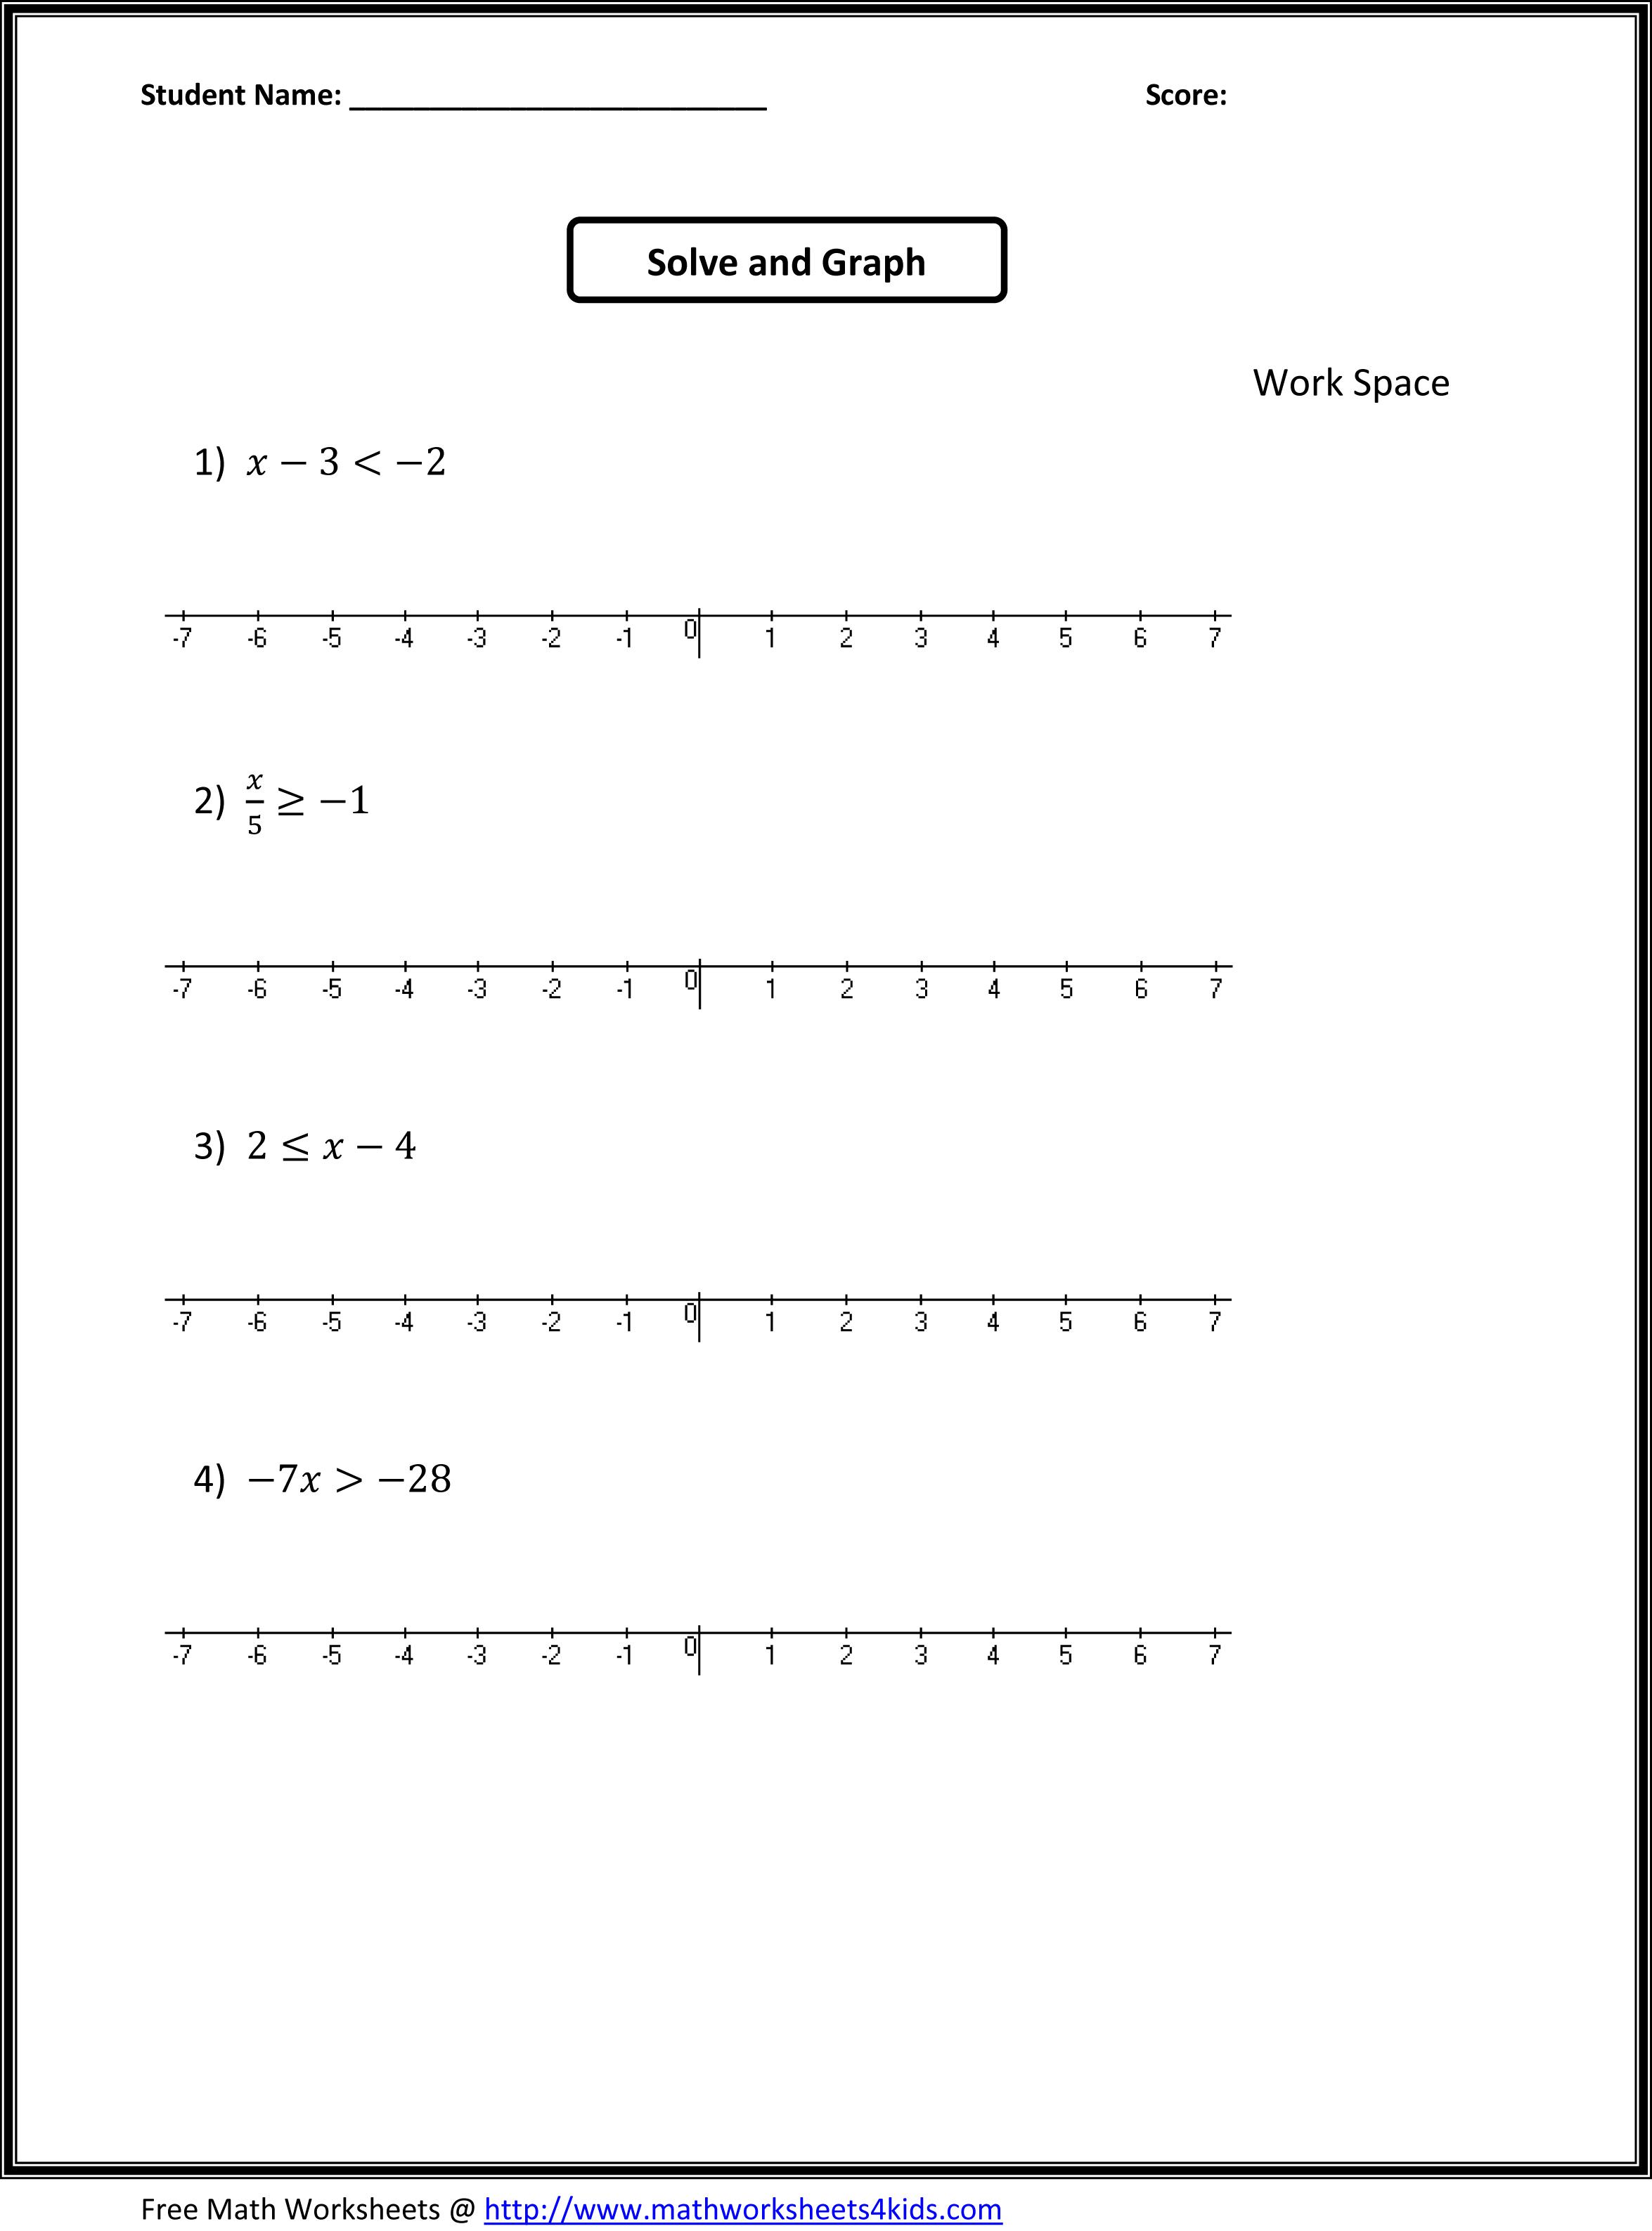 7th grade math worksheets algebra